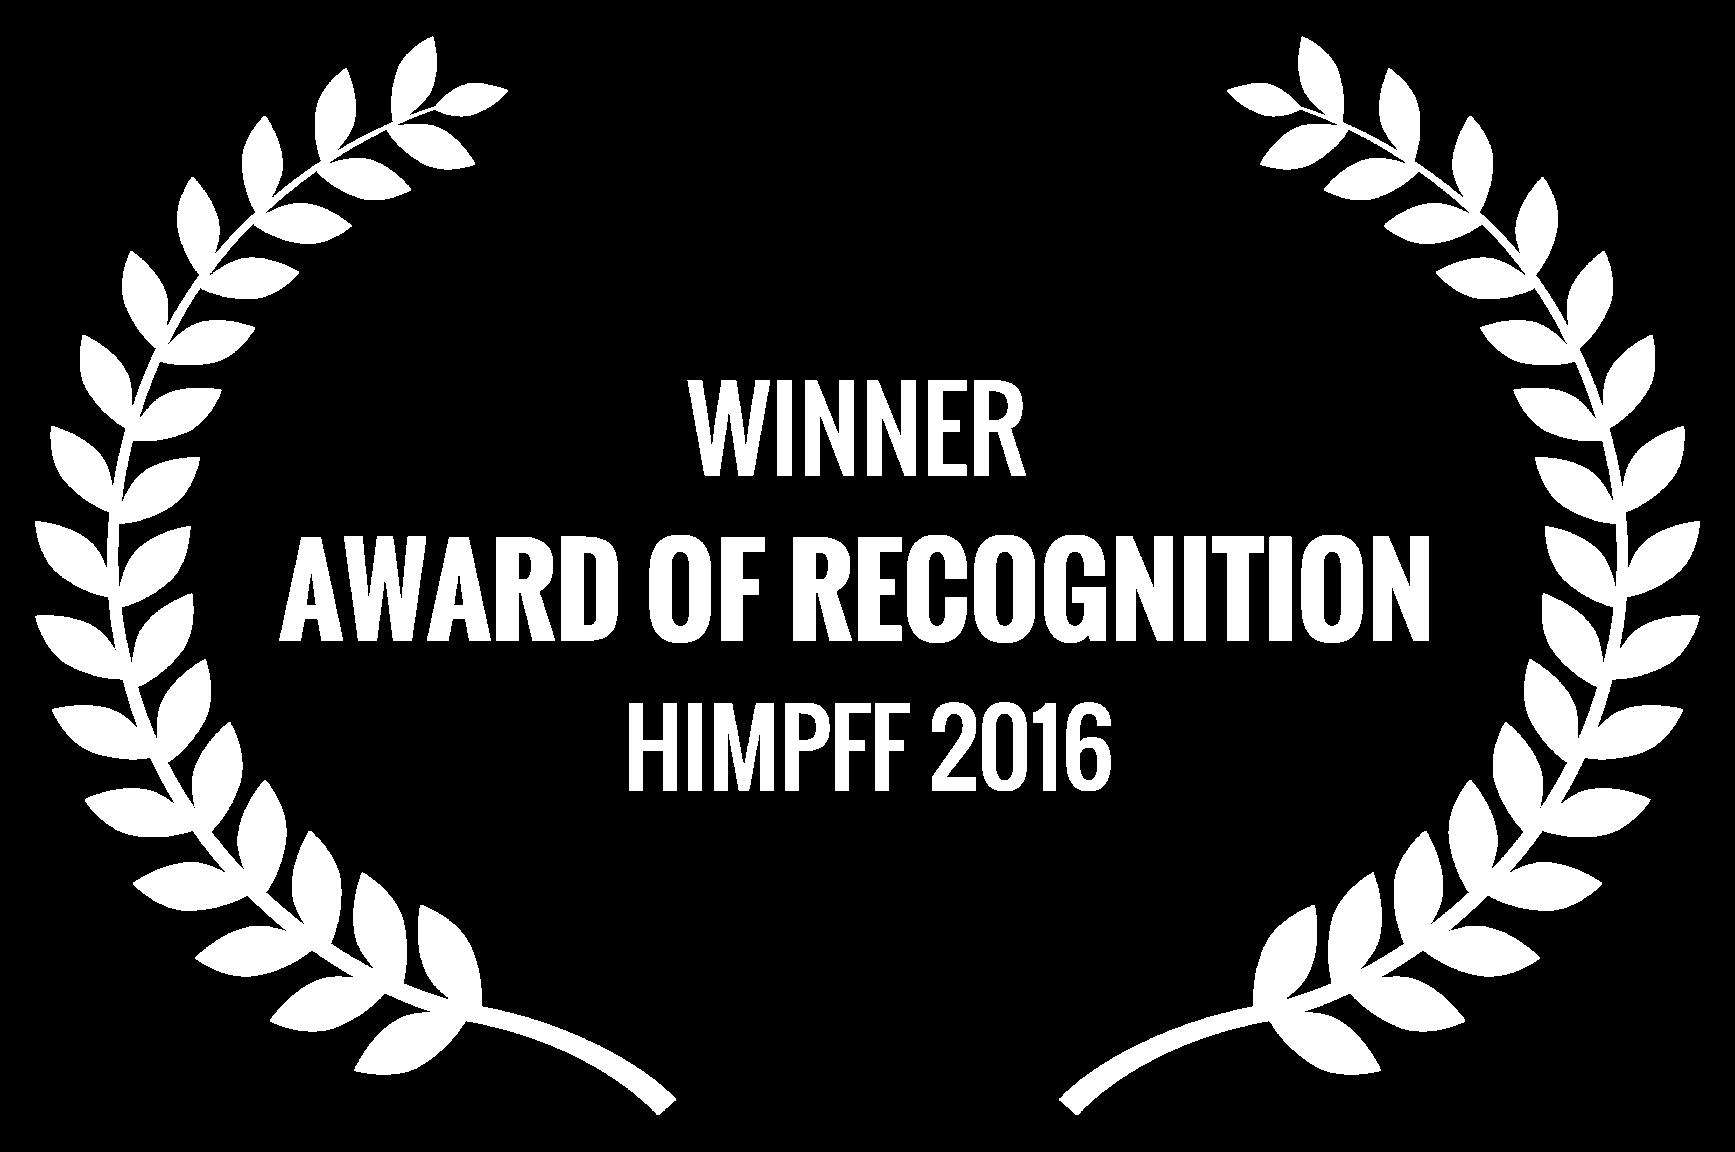 WINNER  - AWARD OF RECOGNITION  - HIMPFF 2016.png